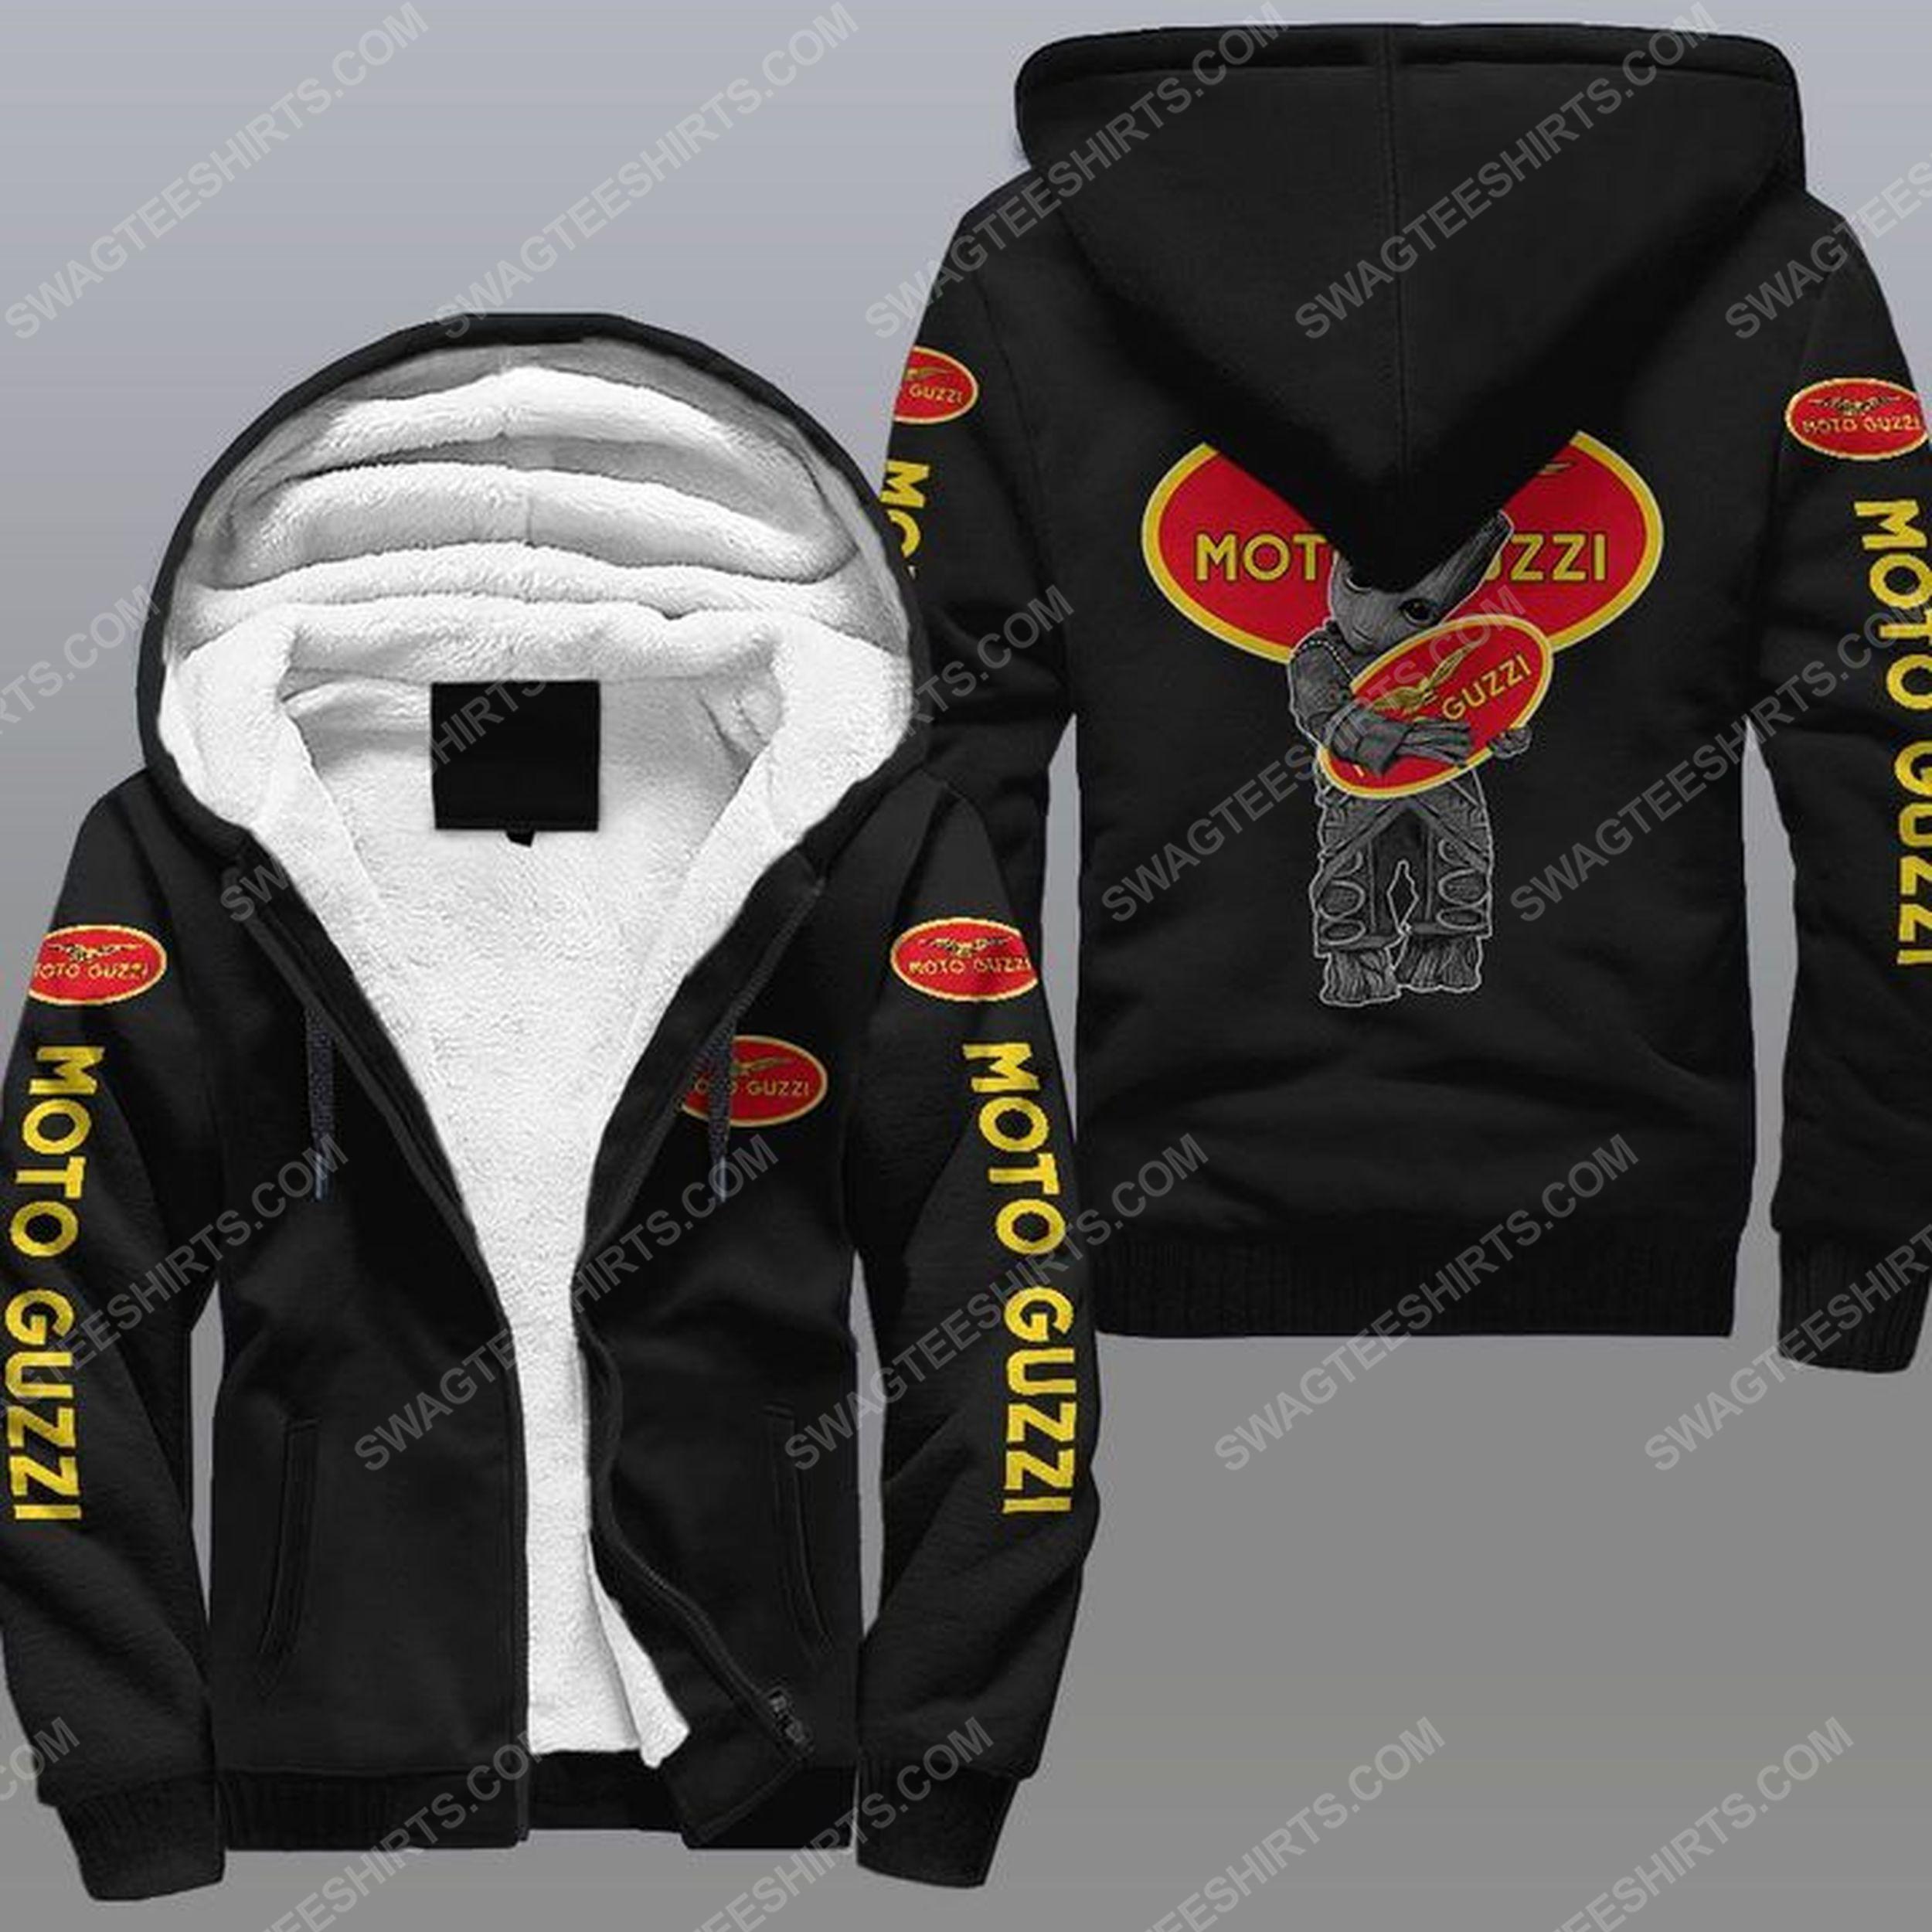 Baby groot and moto guzzi all over print fleece hoodie - black 1